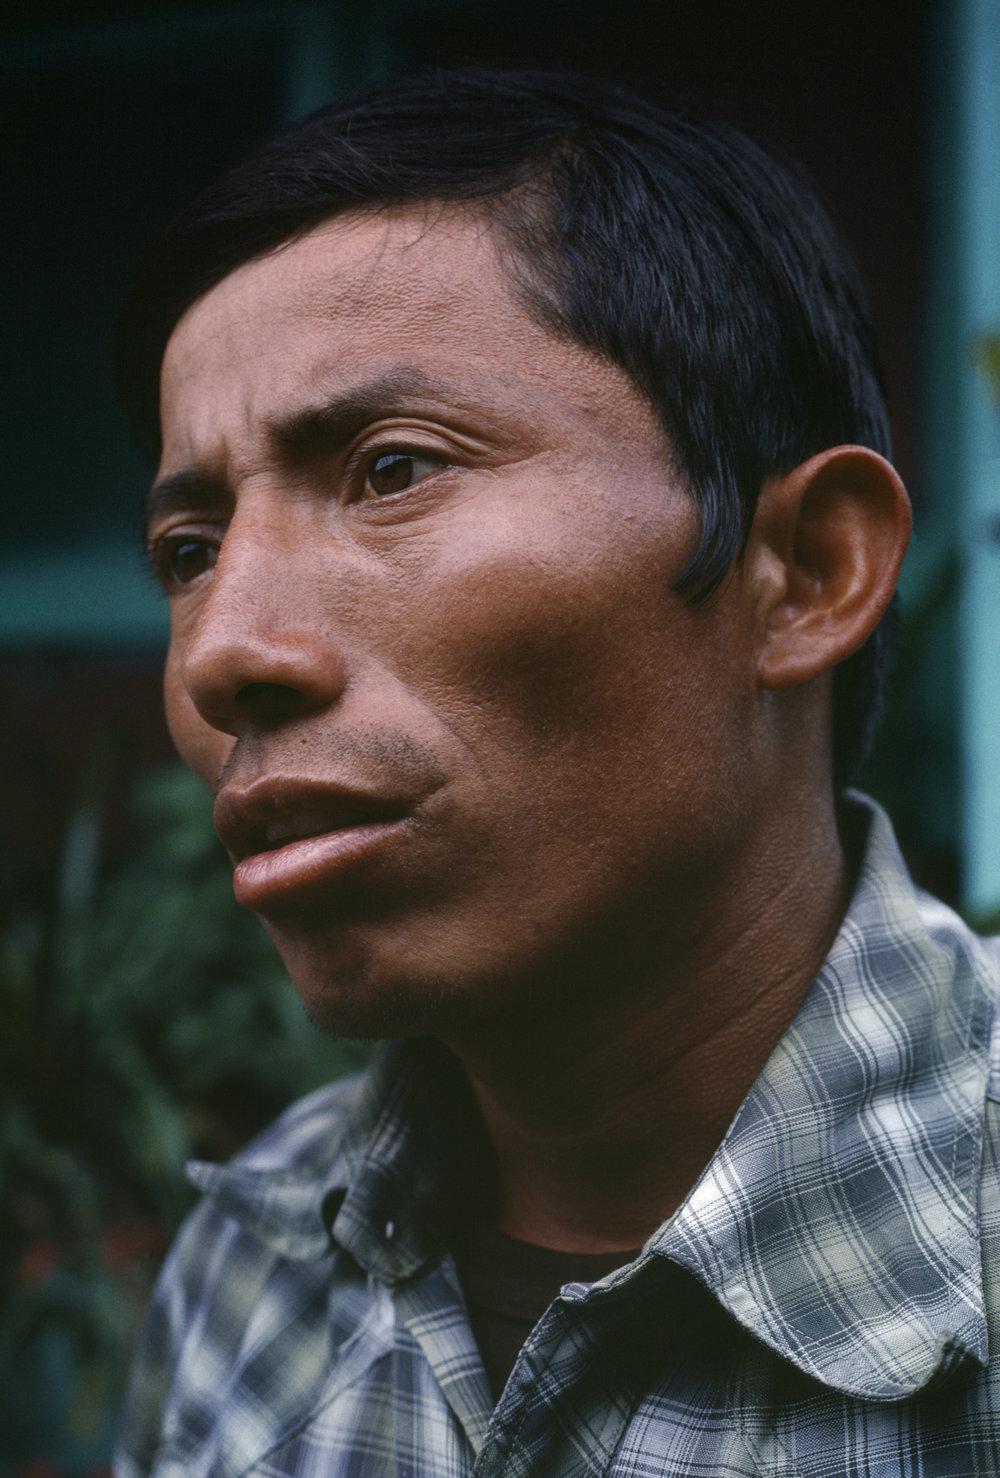 A local civil defenseman speaks to a reporter in rural Huehuetenango, Guatemala on September 1, 1982.